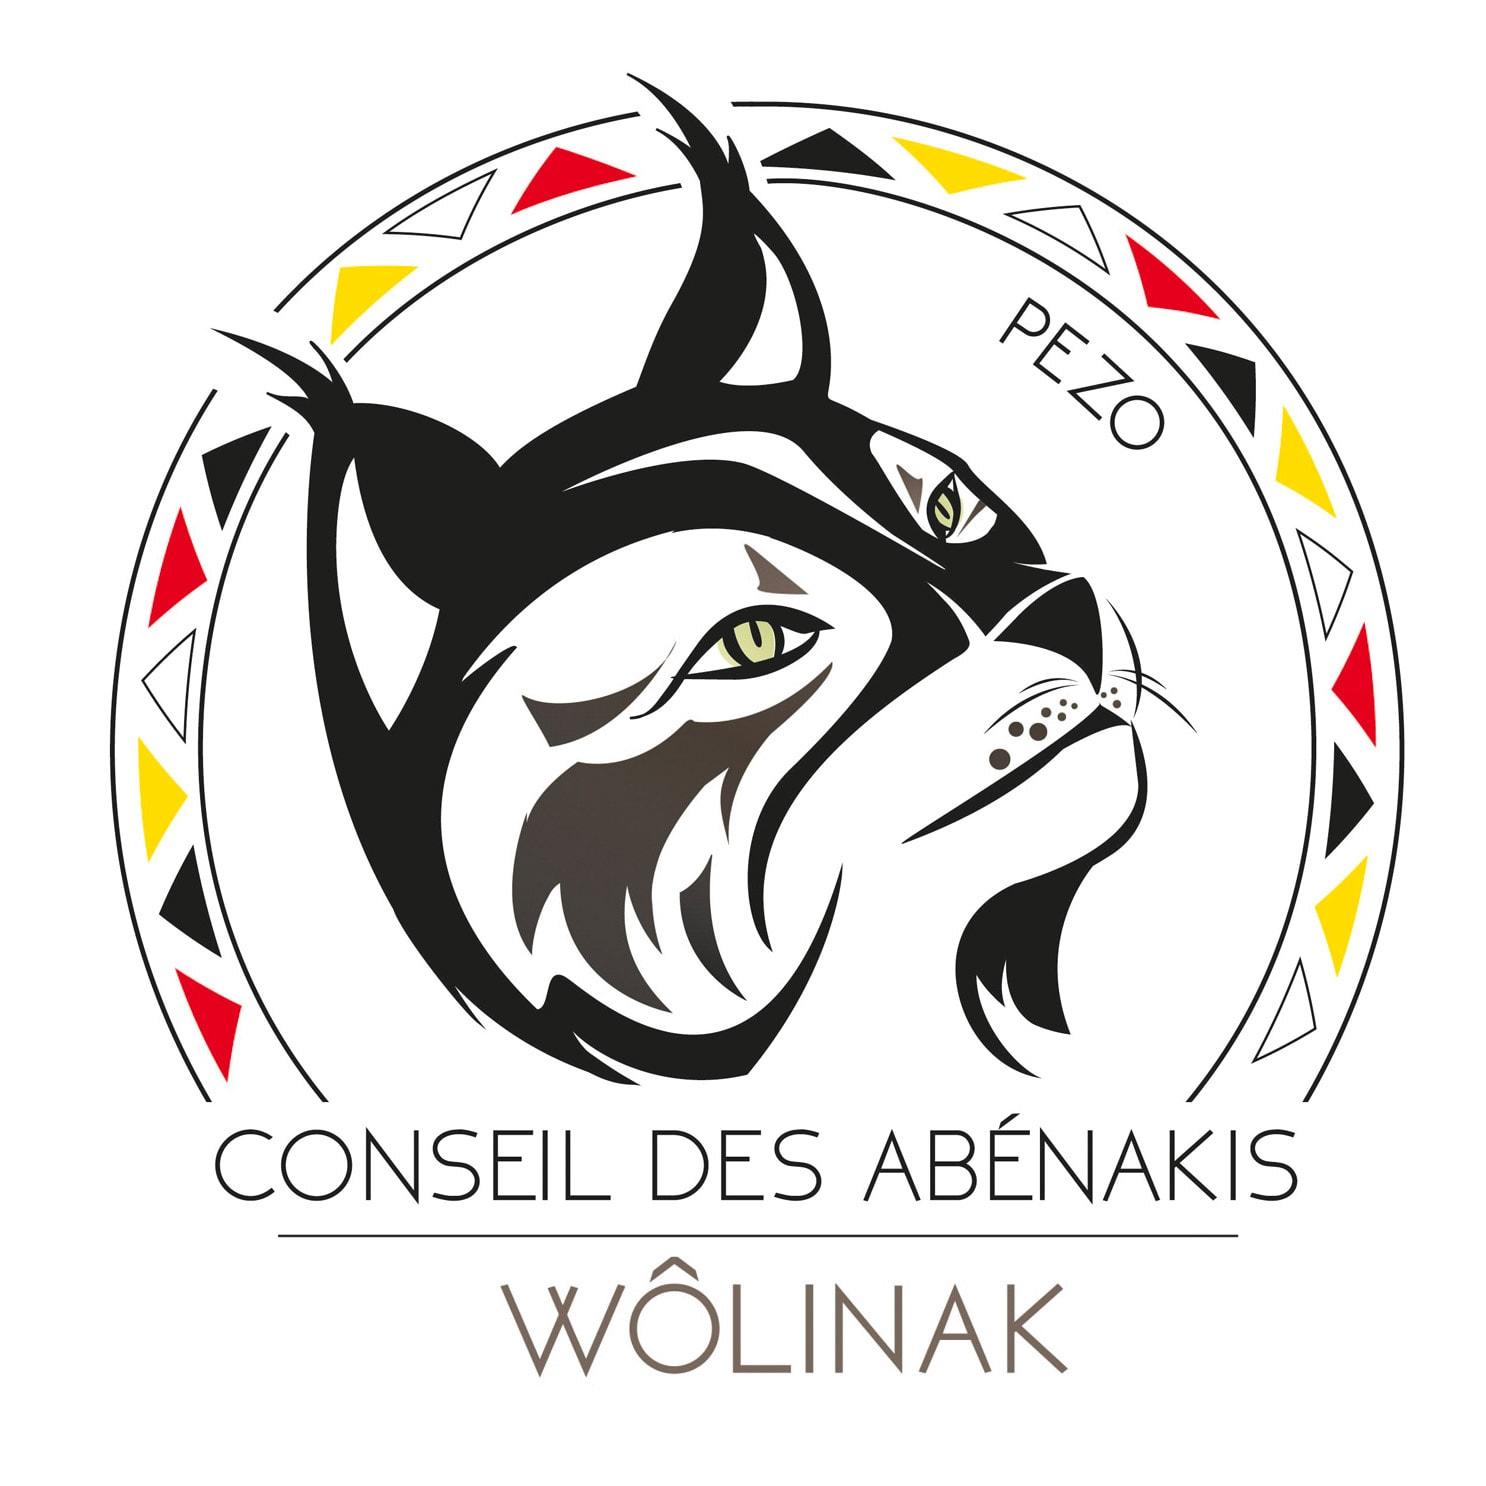 Conseil des Abenakis de Wolinak • First Nations Land